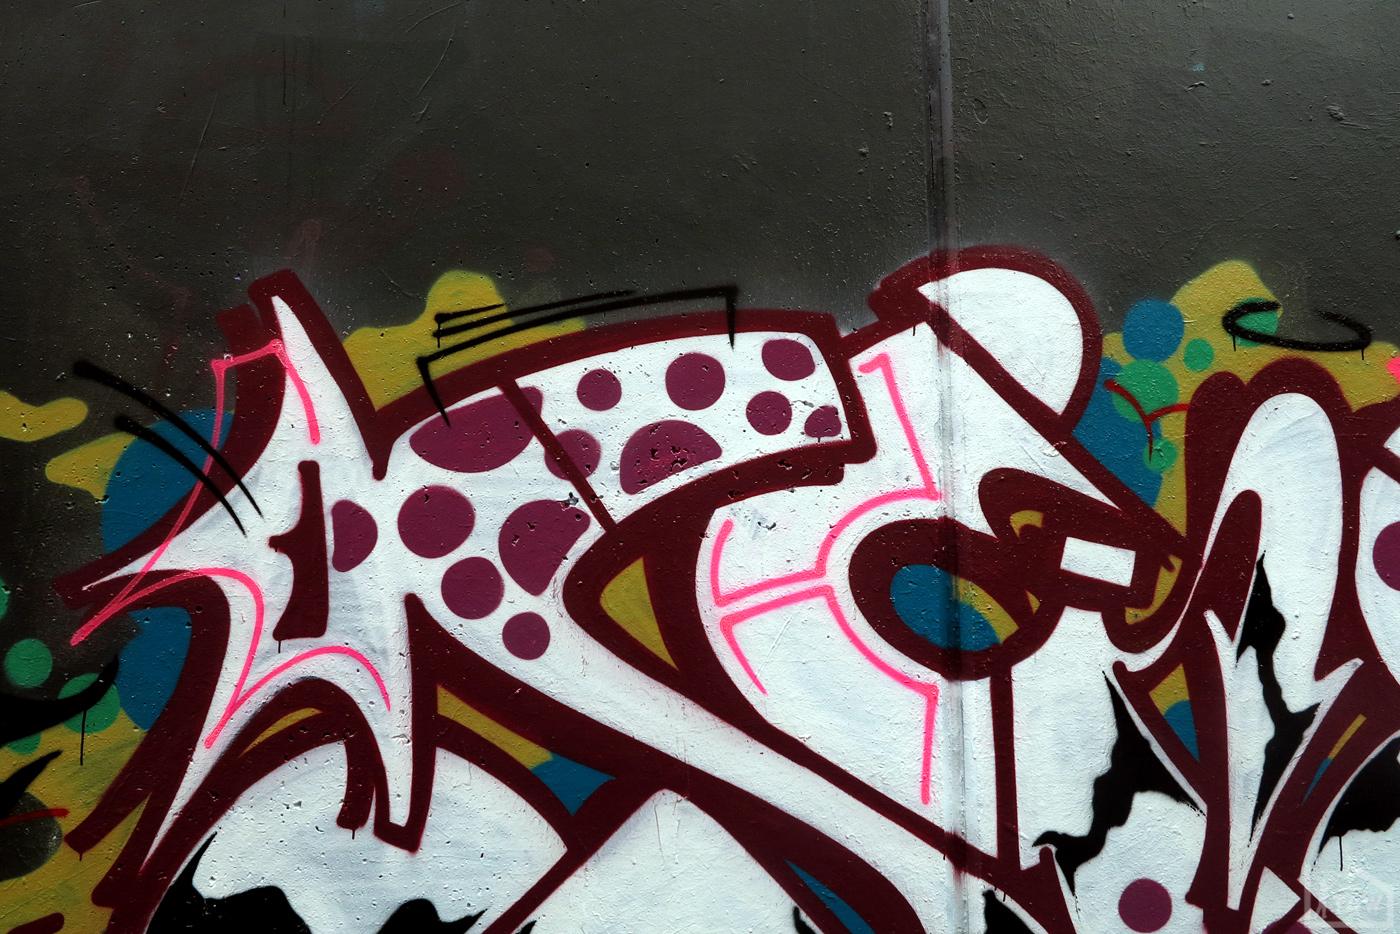 the-fourth-walls-melbourne-graffiti-sup-dvate-petals-daisy-maid-sigs-sabeth-pornograffixxx-fitzroy8